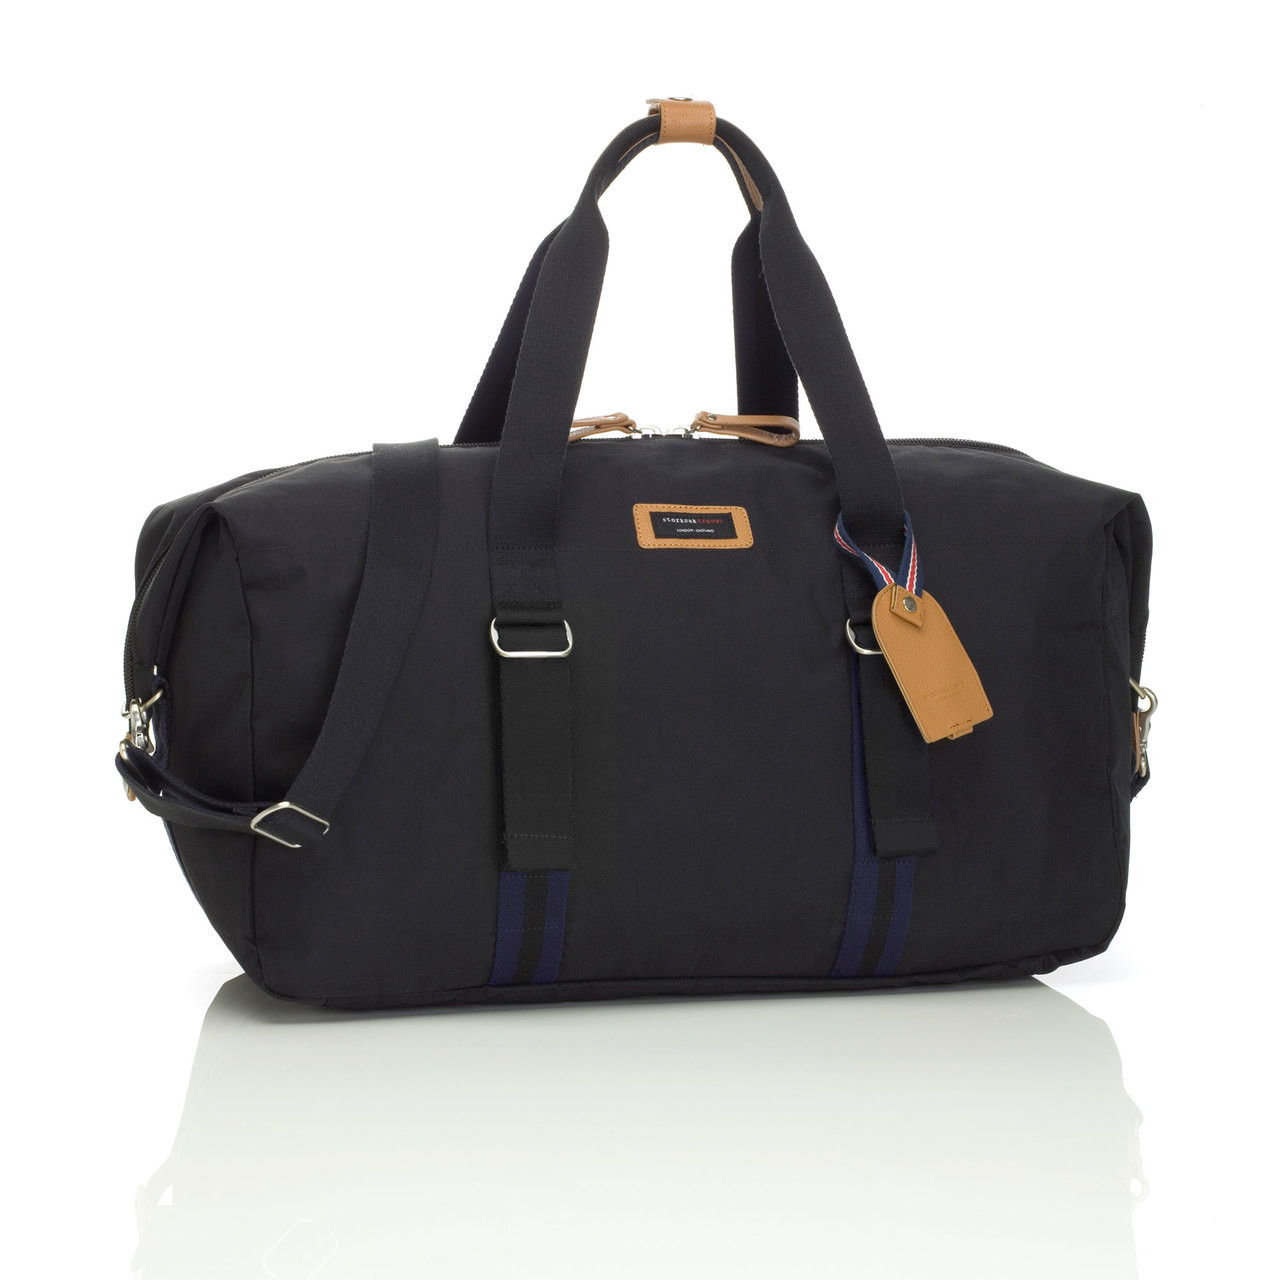 Storksak Black Travel Duffle Bag / Hospital